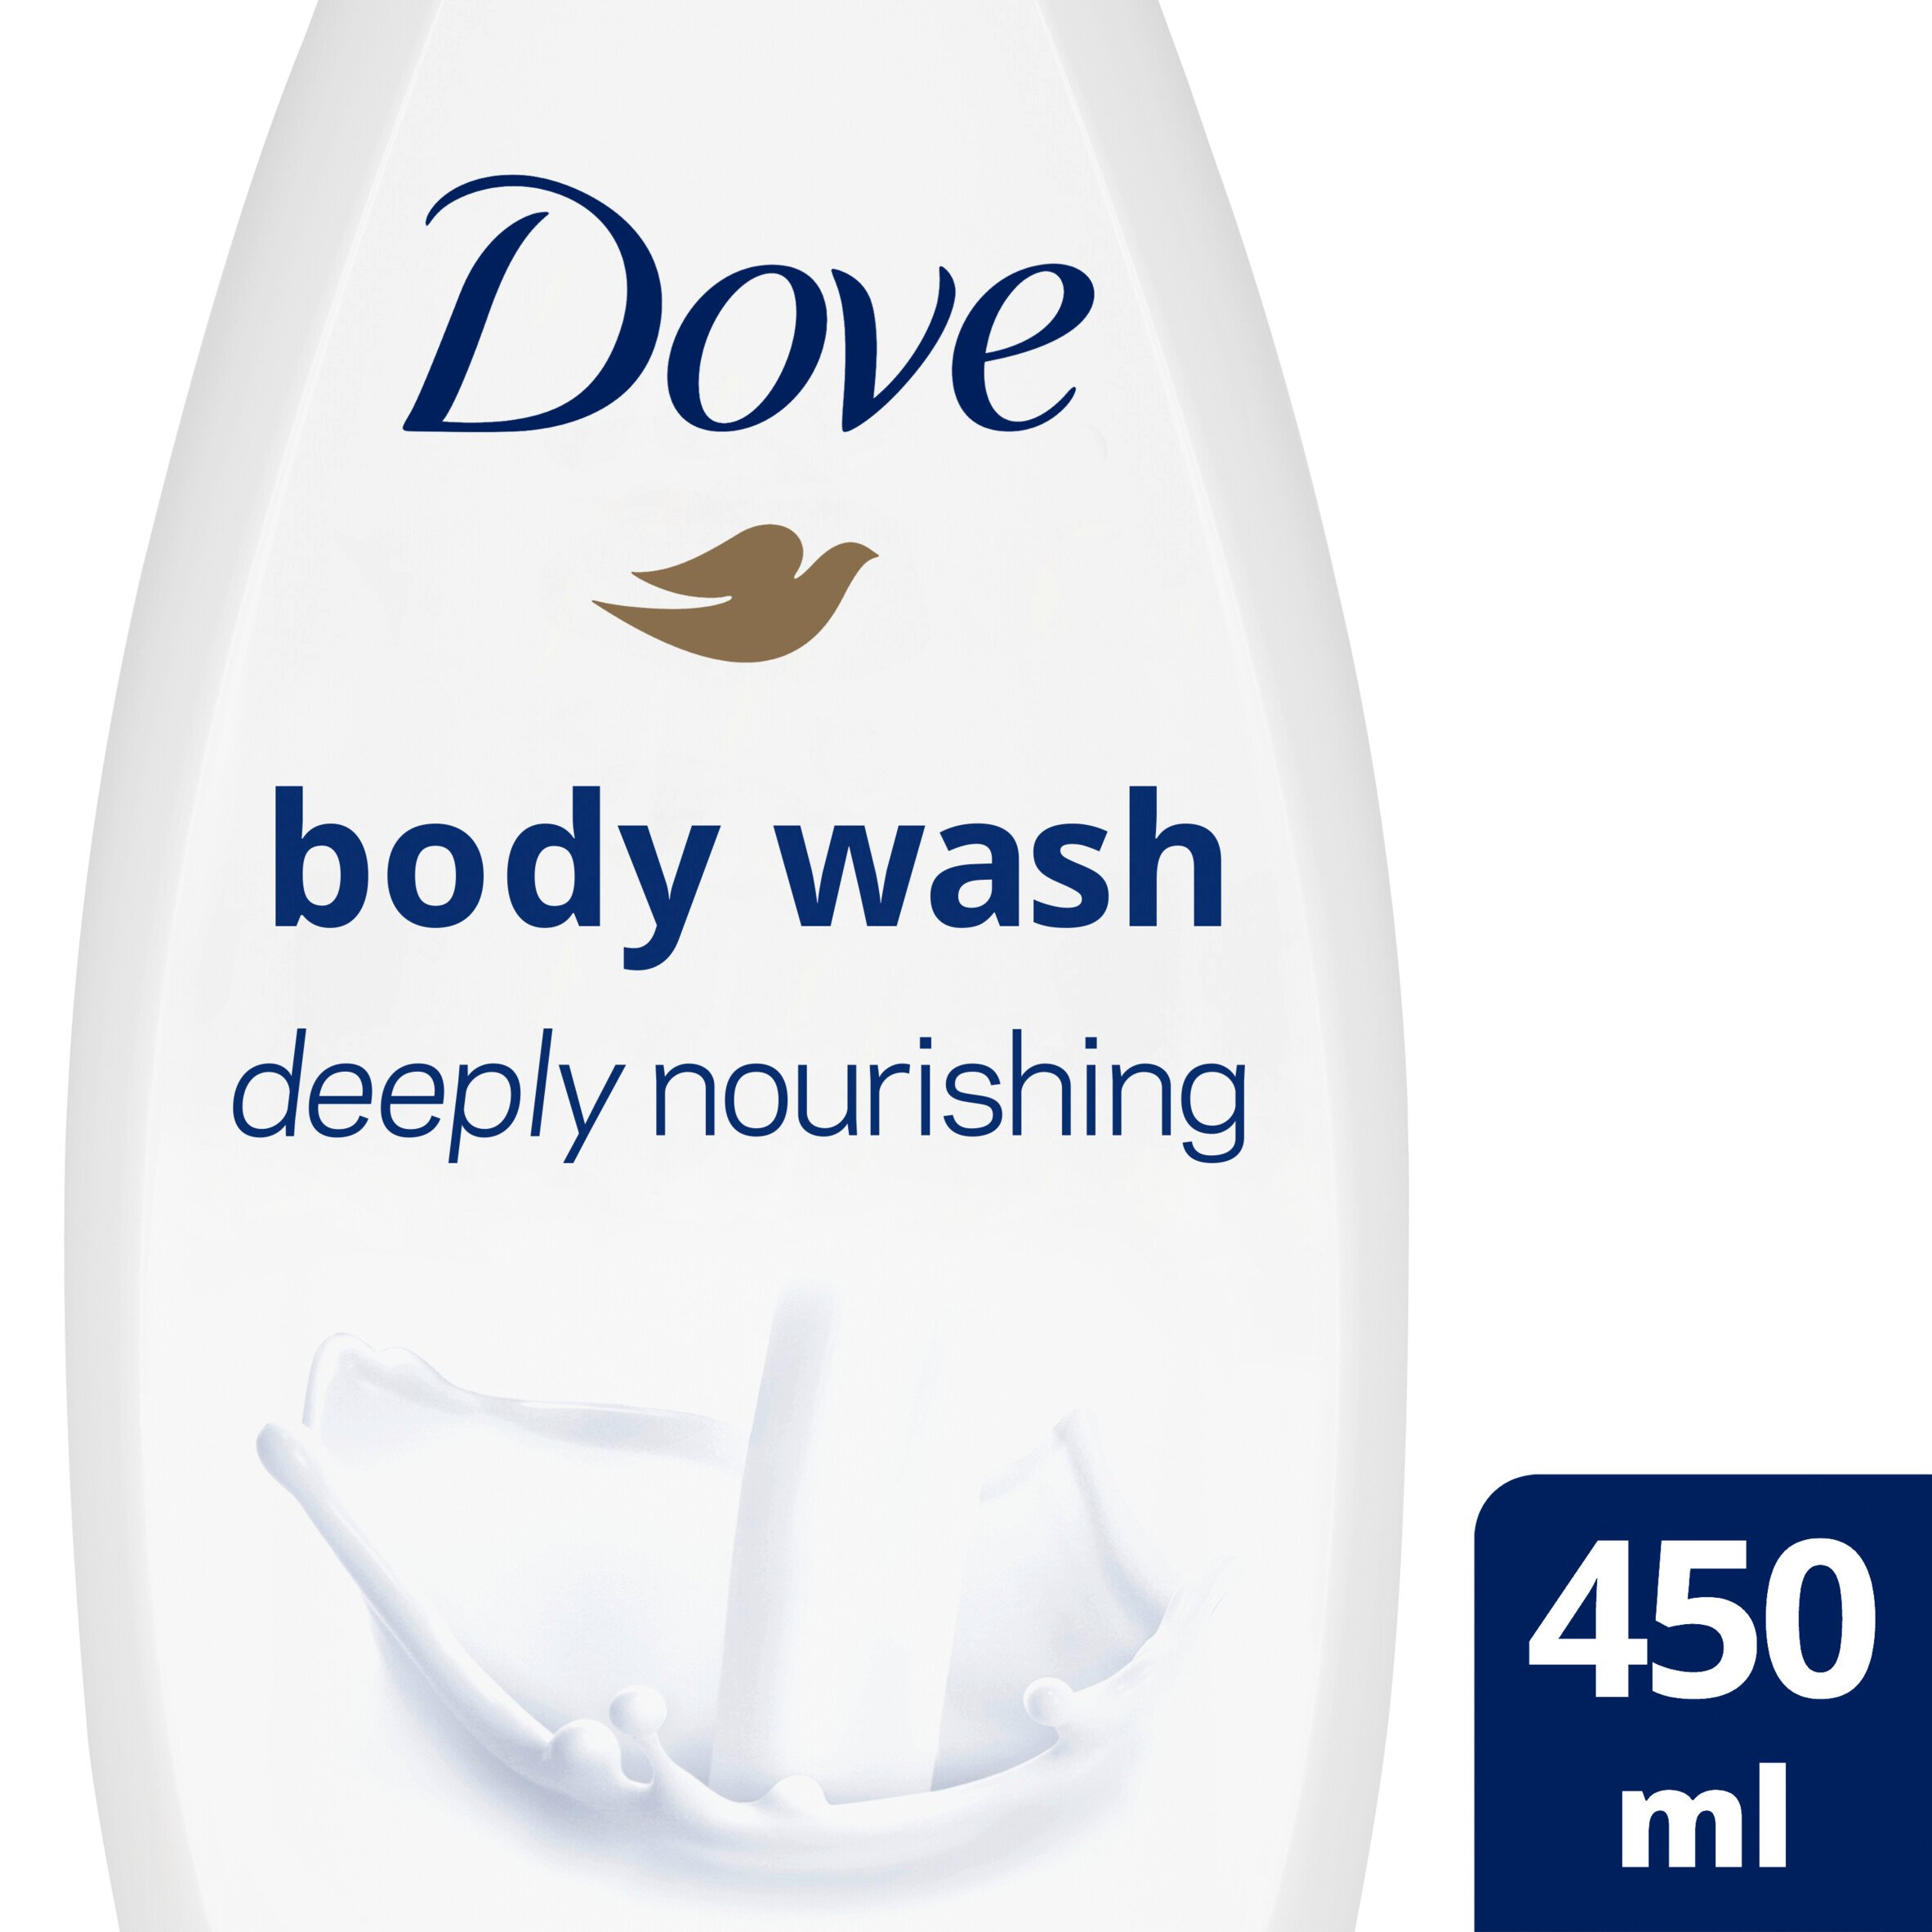 Dove Deeply Nourishing Body Wash 450Ml